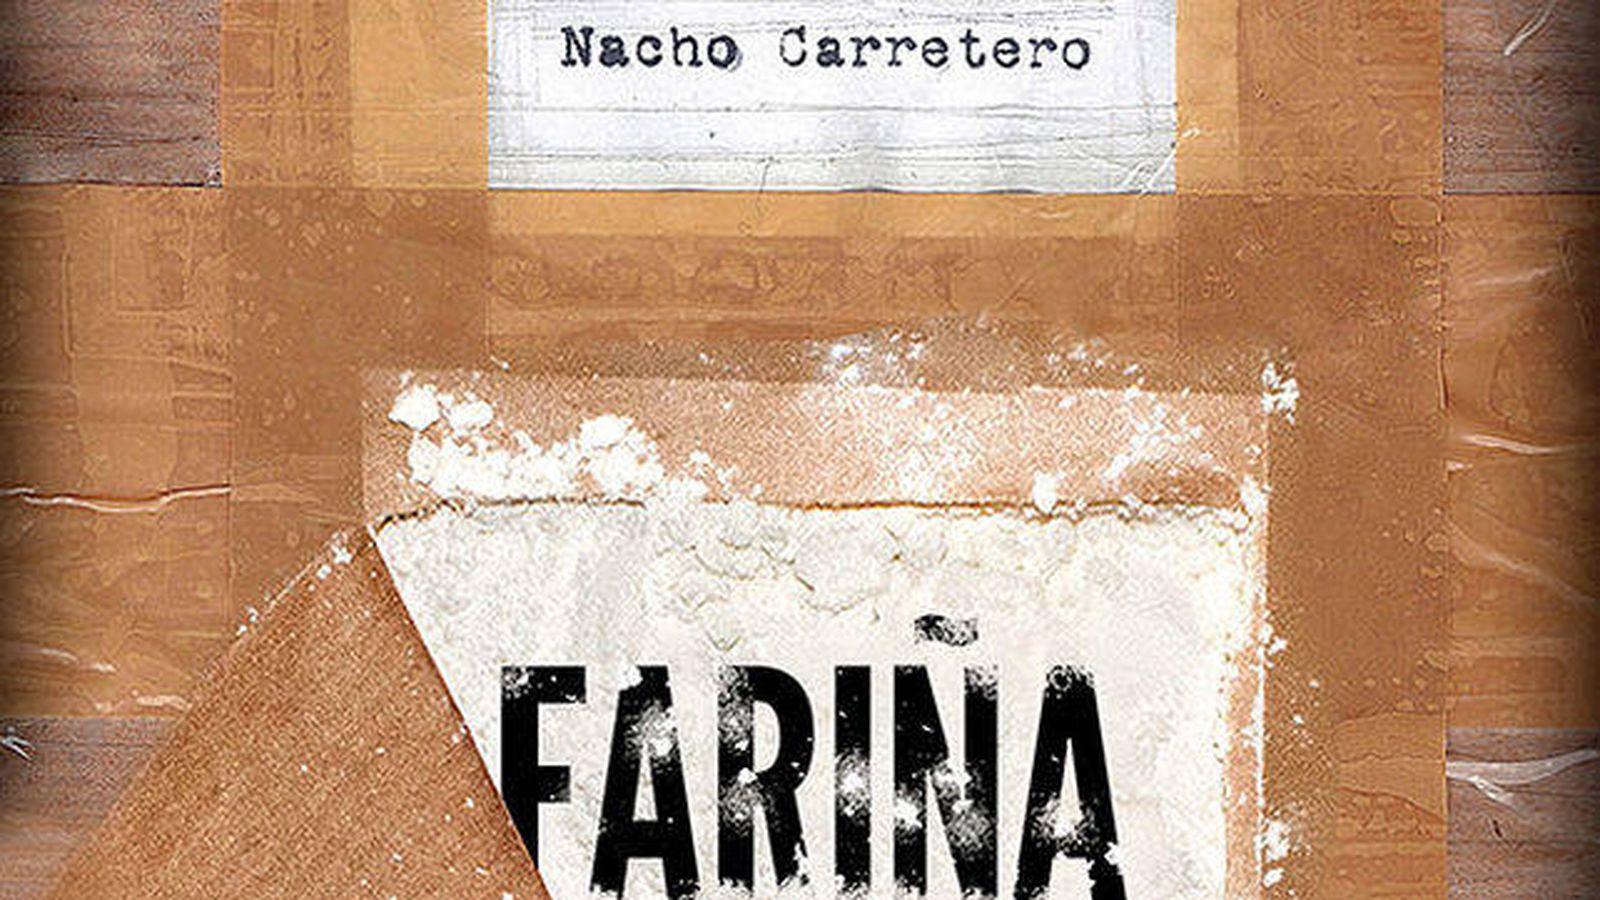 Foto: Fragmento de la portada del libro de Nacho Carretero, 'Fariña'.